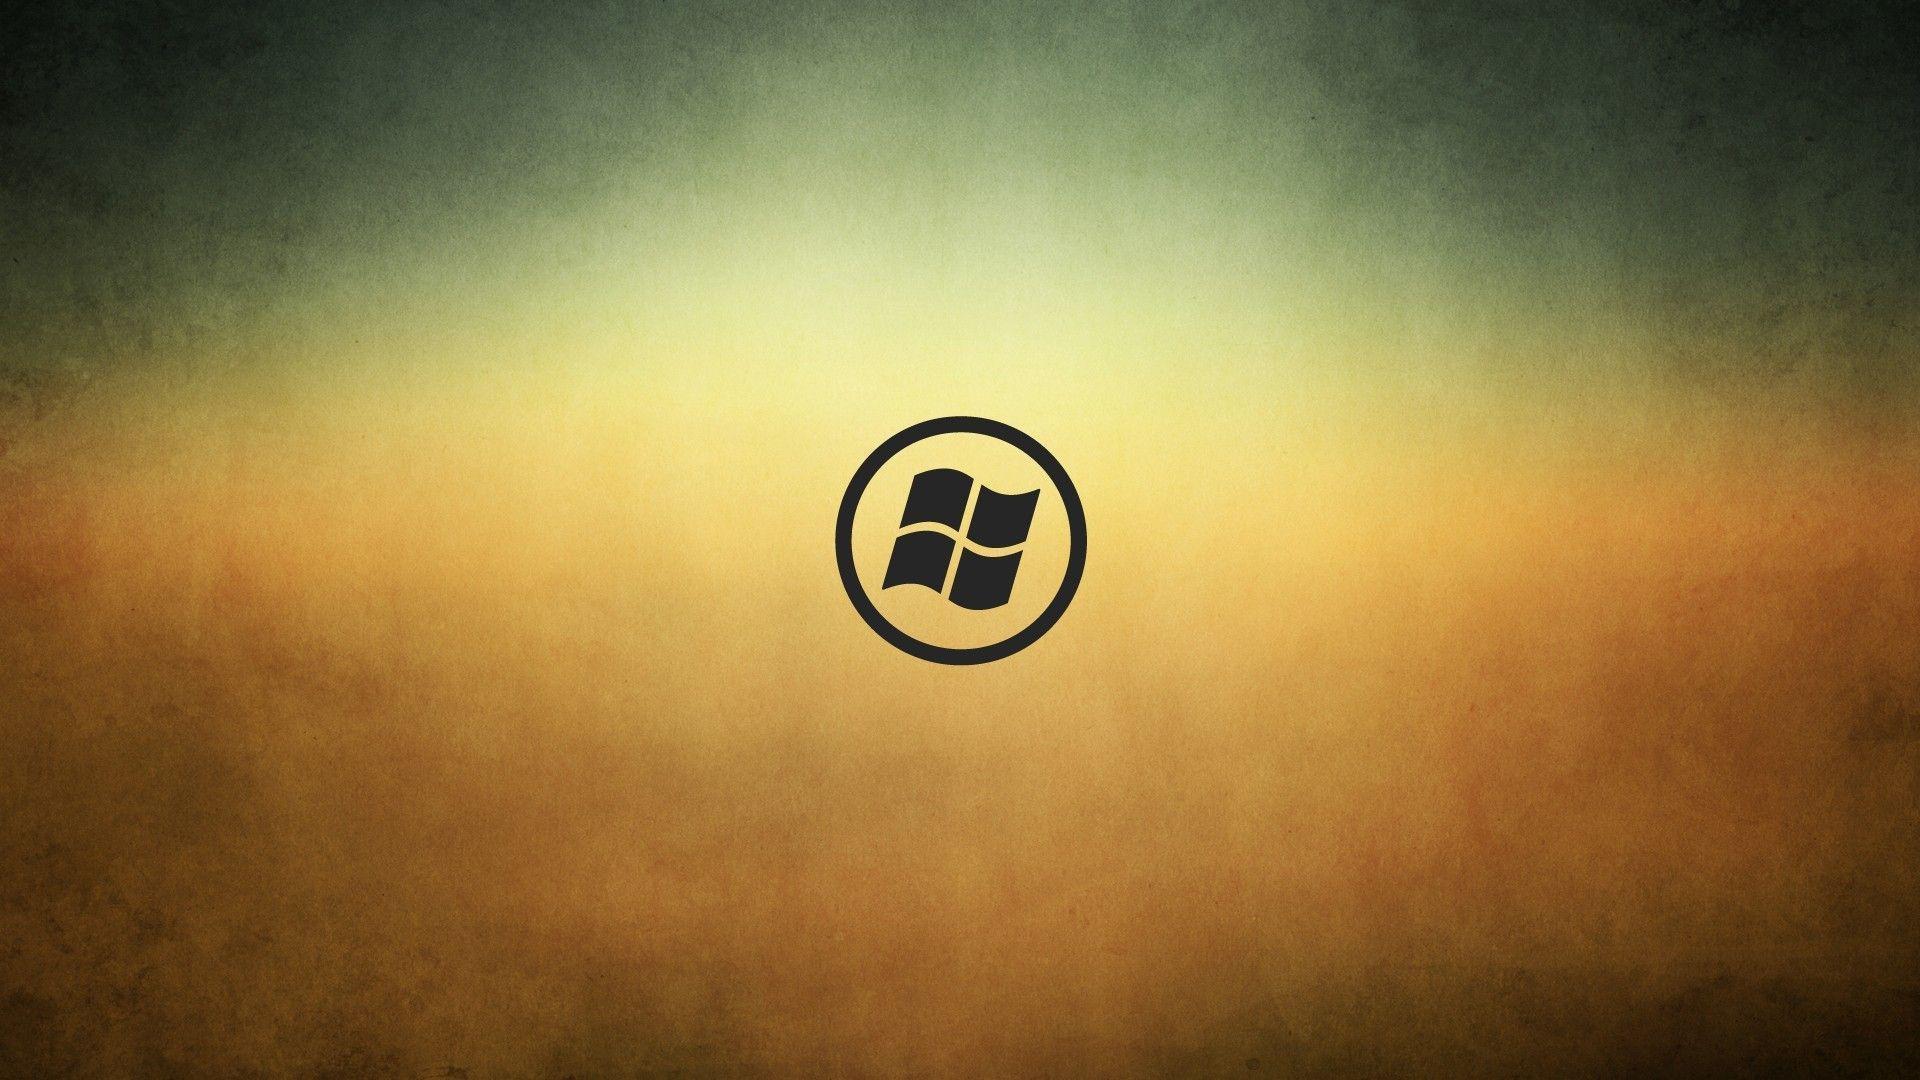 10 Latest 3d Wallpaper For Laptop Full Hd 1080p For Pc Desktop: Windows 8 Wallpapers HD